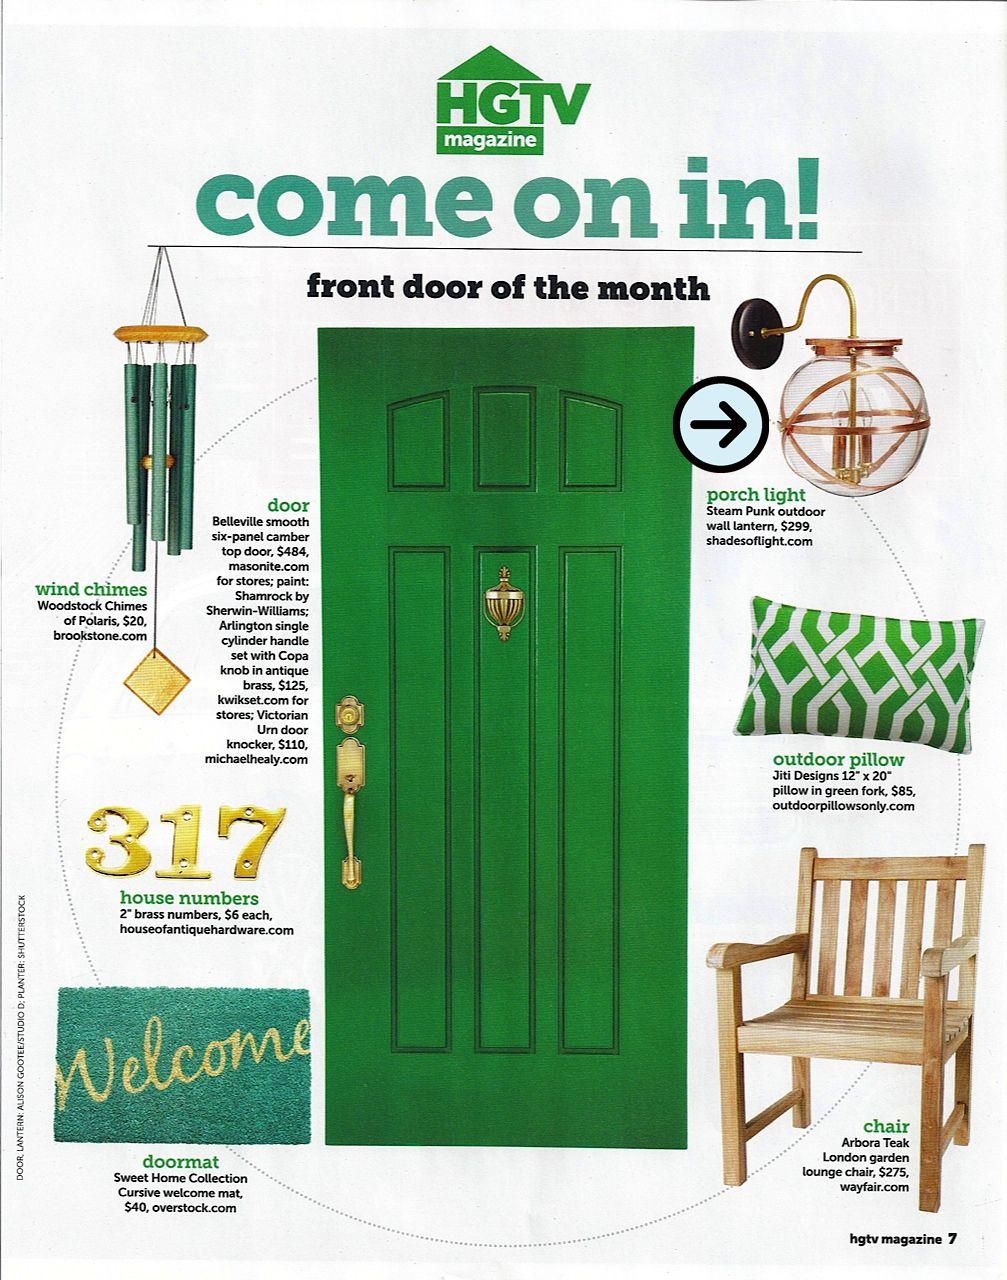 HGTV magazine + front doors - Google Search  sc 1 st  Pinterest & Steam Punk Outdoor Wall Lantern | Hgtv magazine Hgtv and Front doors pezcame.com